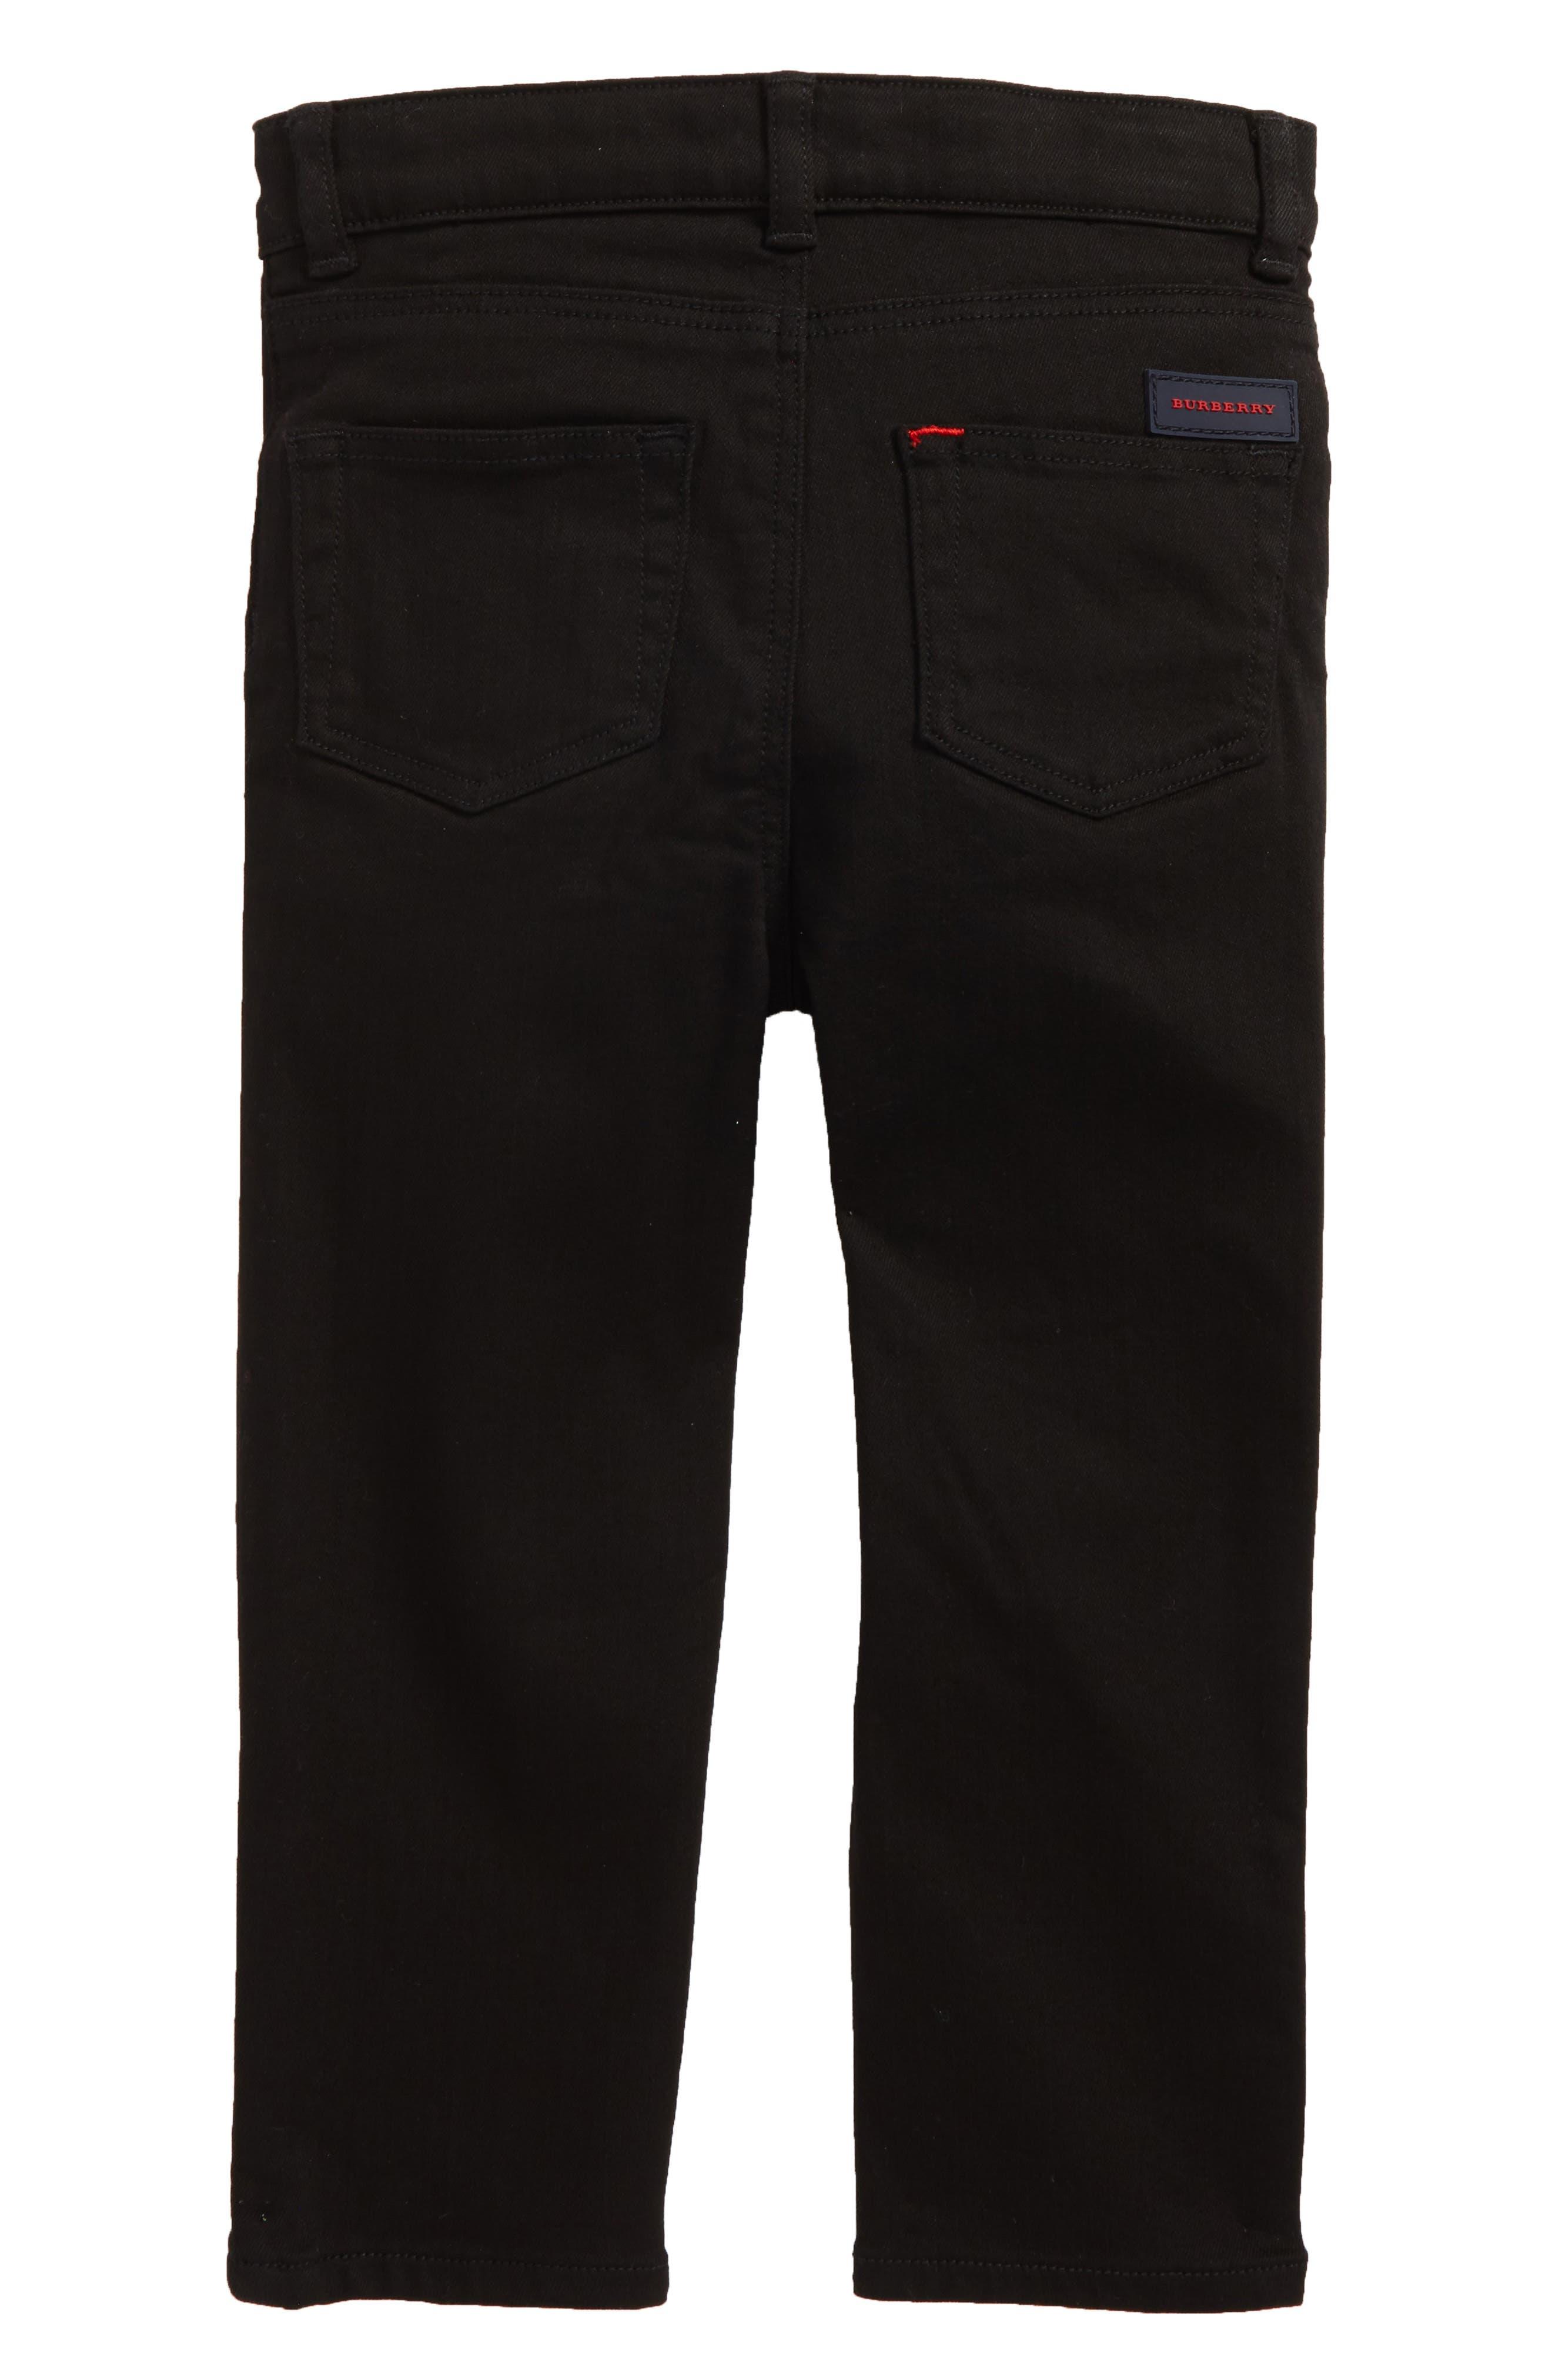 Alternate Image 2  - Burberry Skinny Jeans (Toddler Boys, Little Boys & Big Boys)